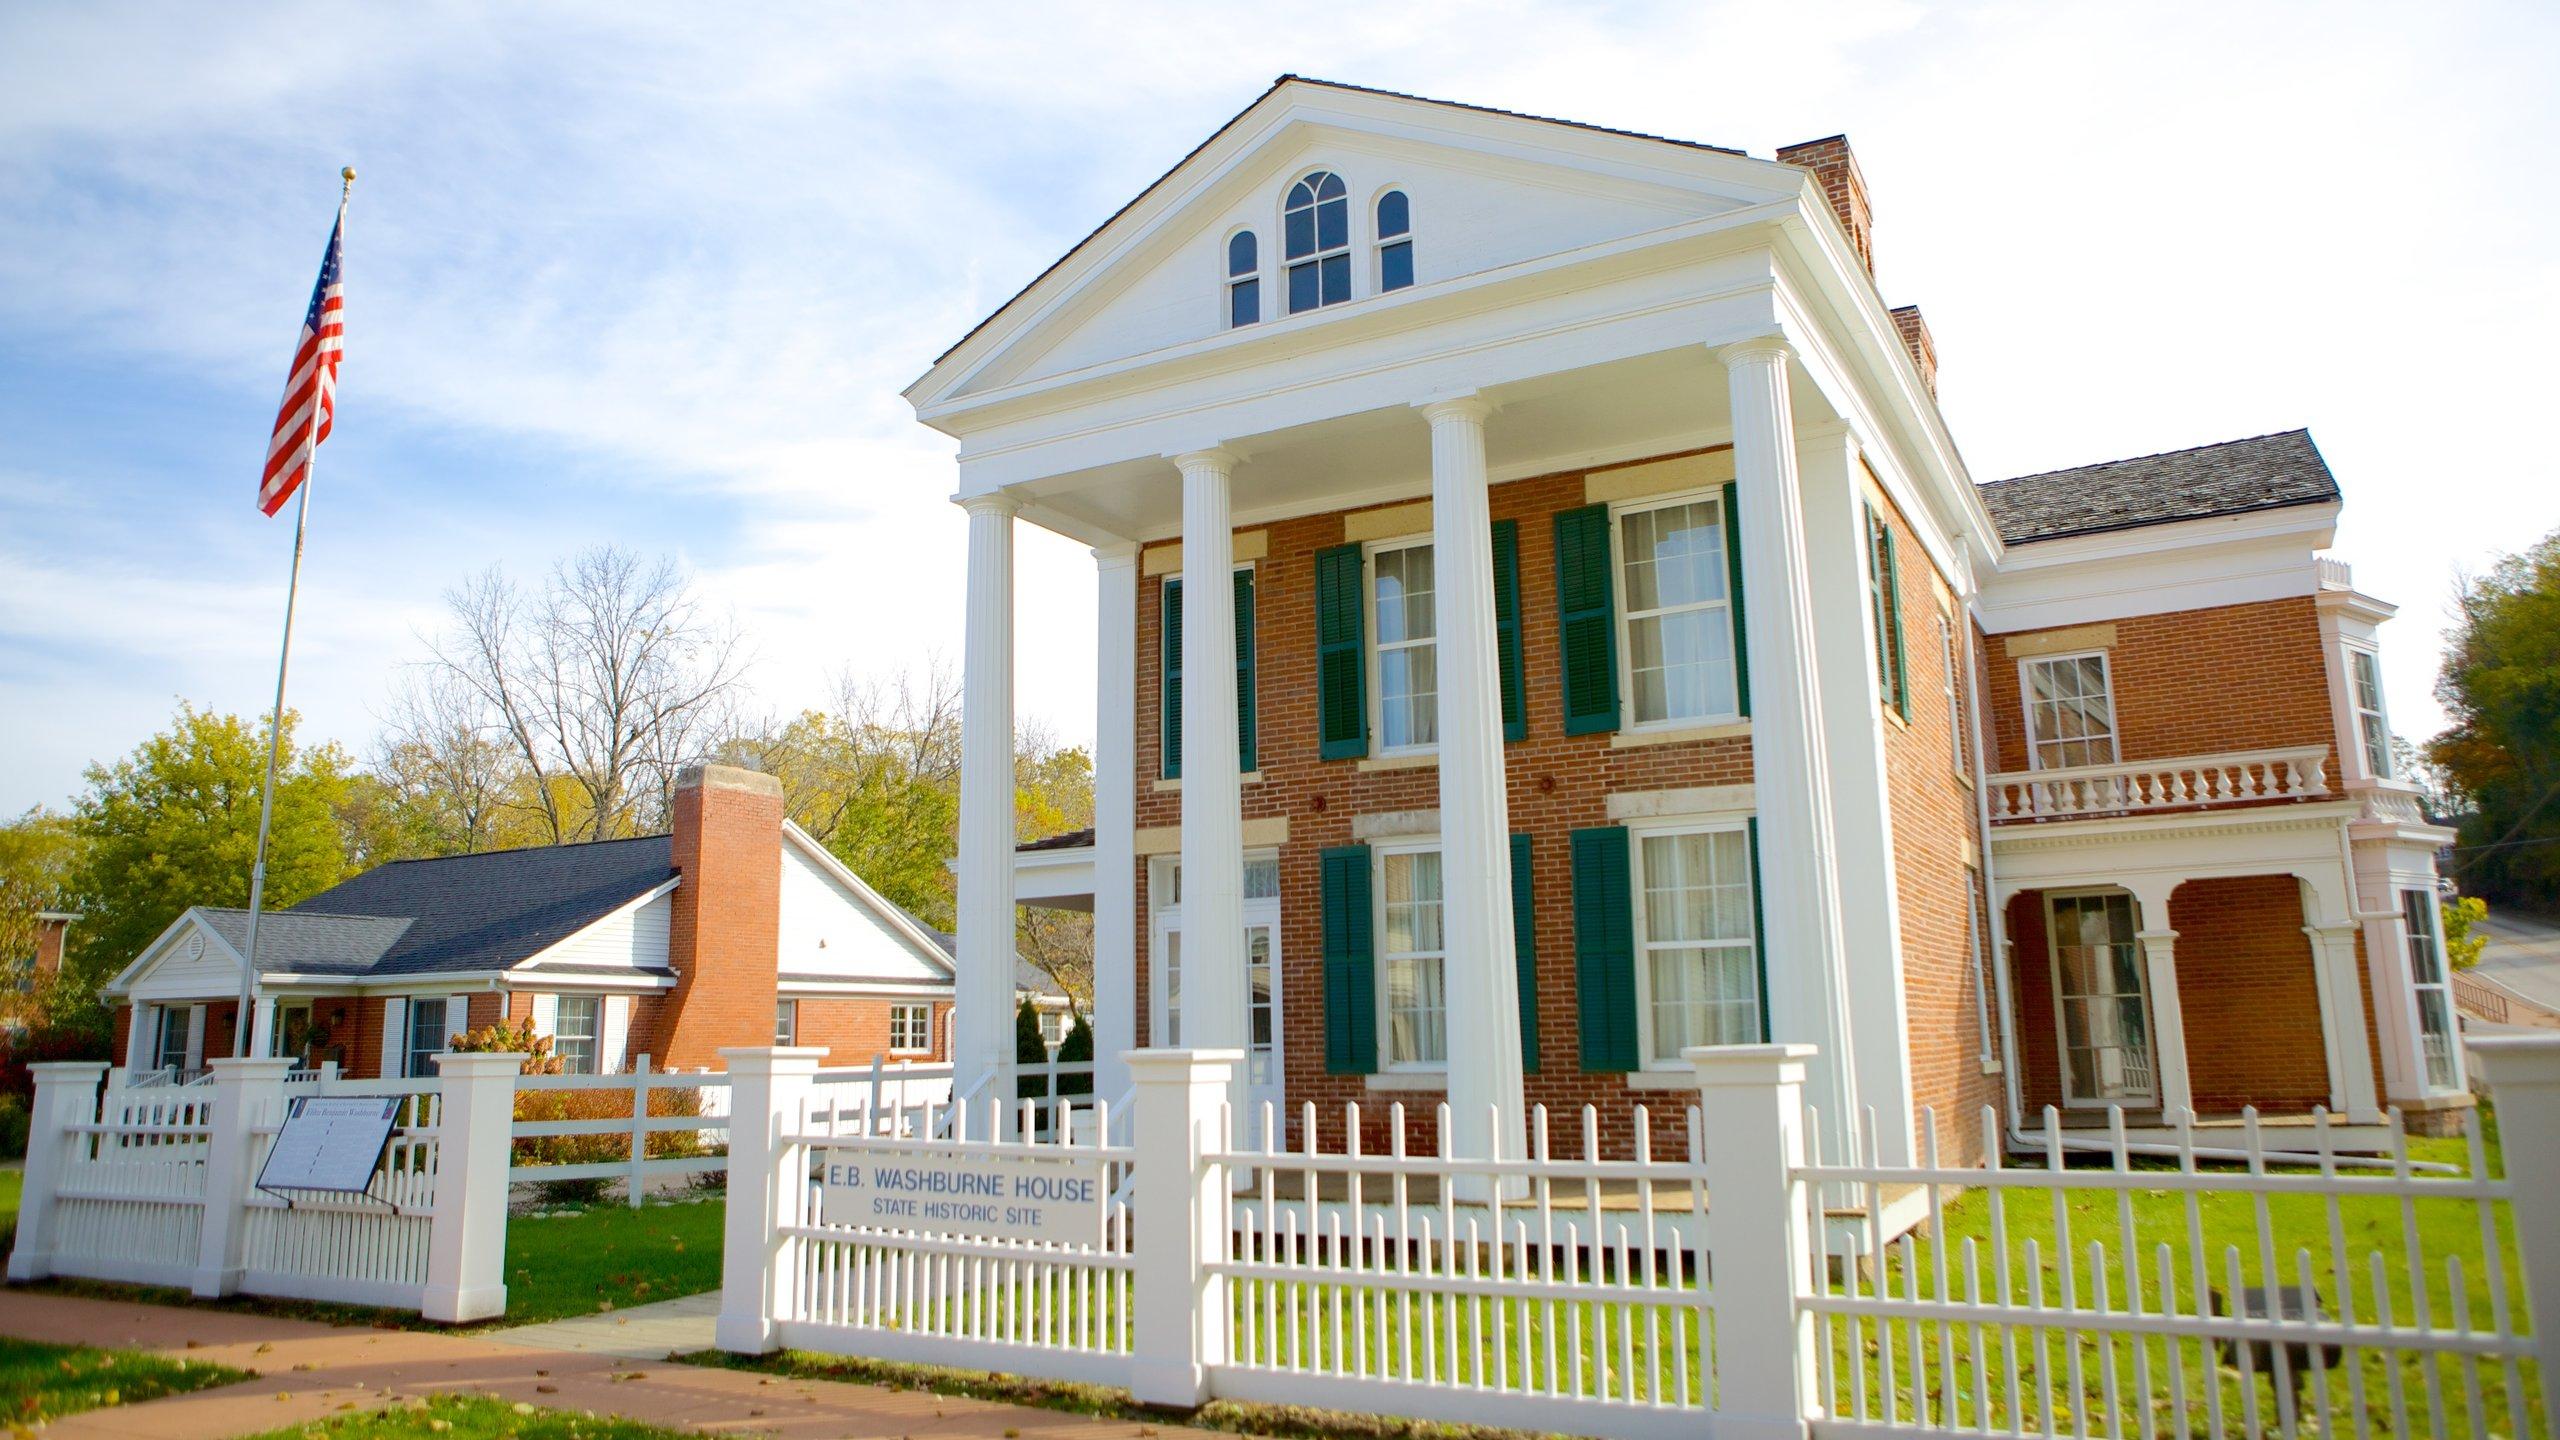 Washburne House Historic Site, Galena, Illinois, USA